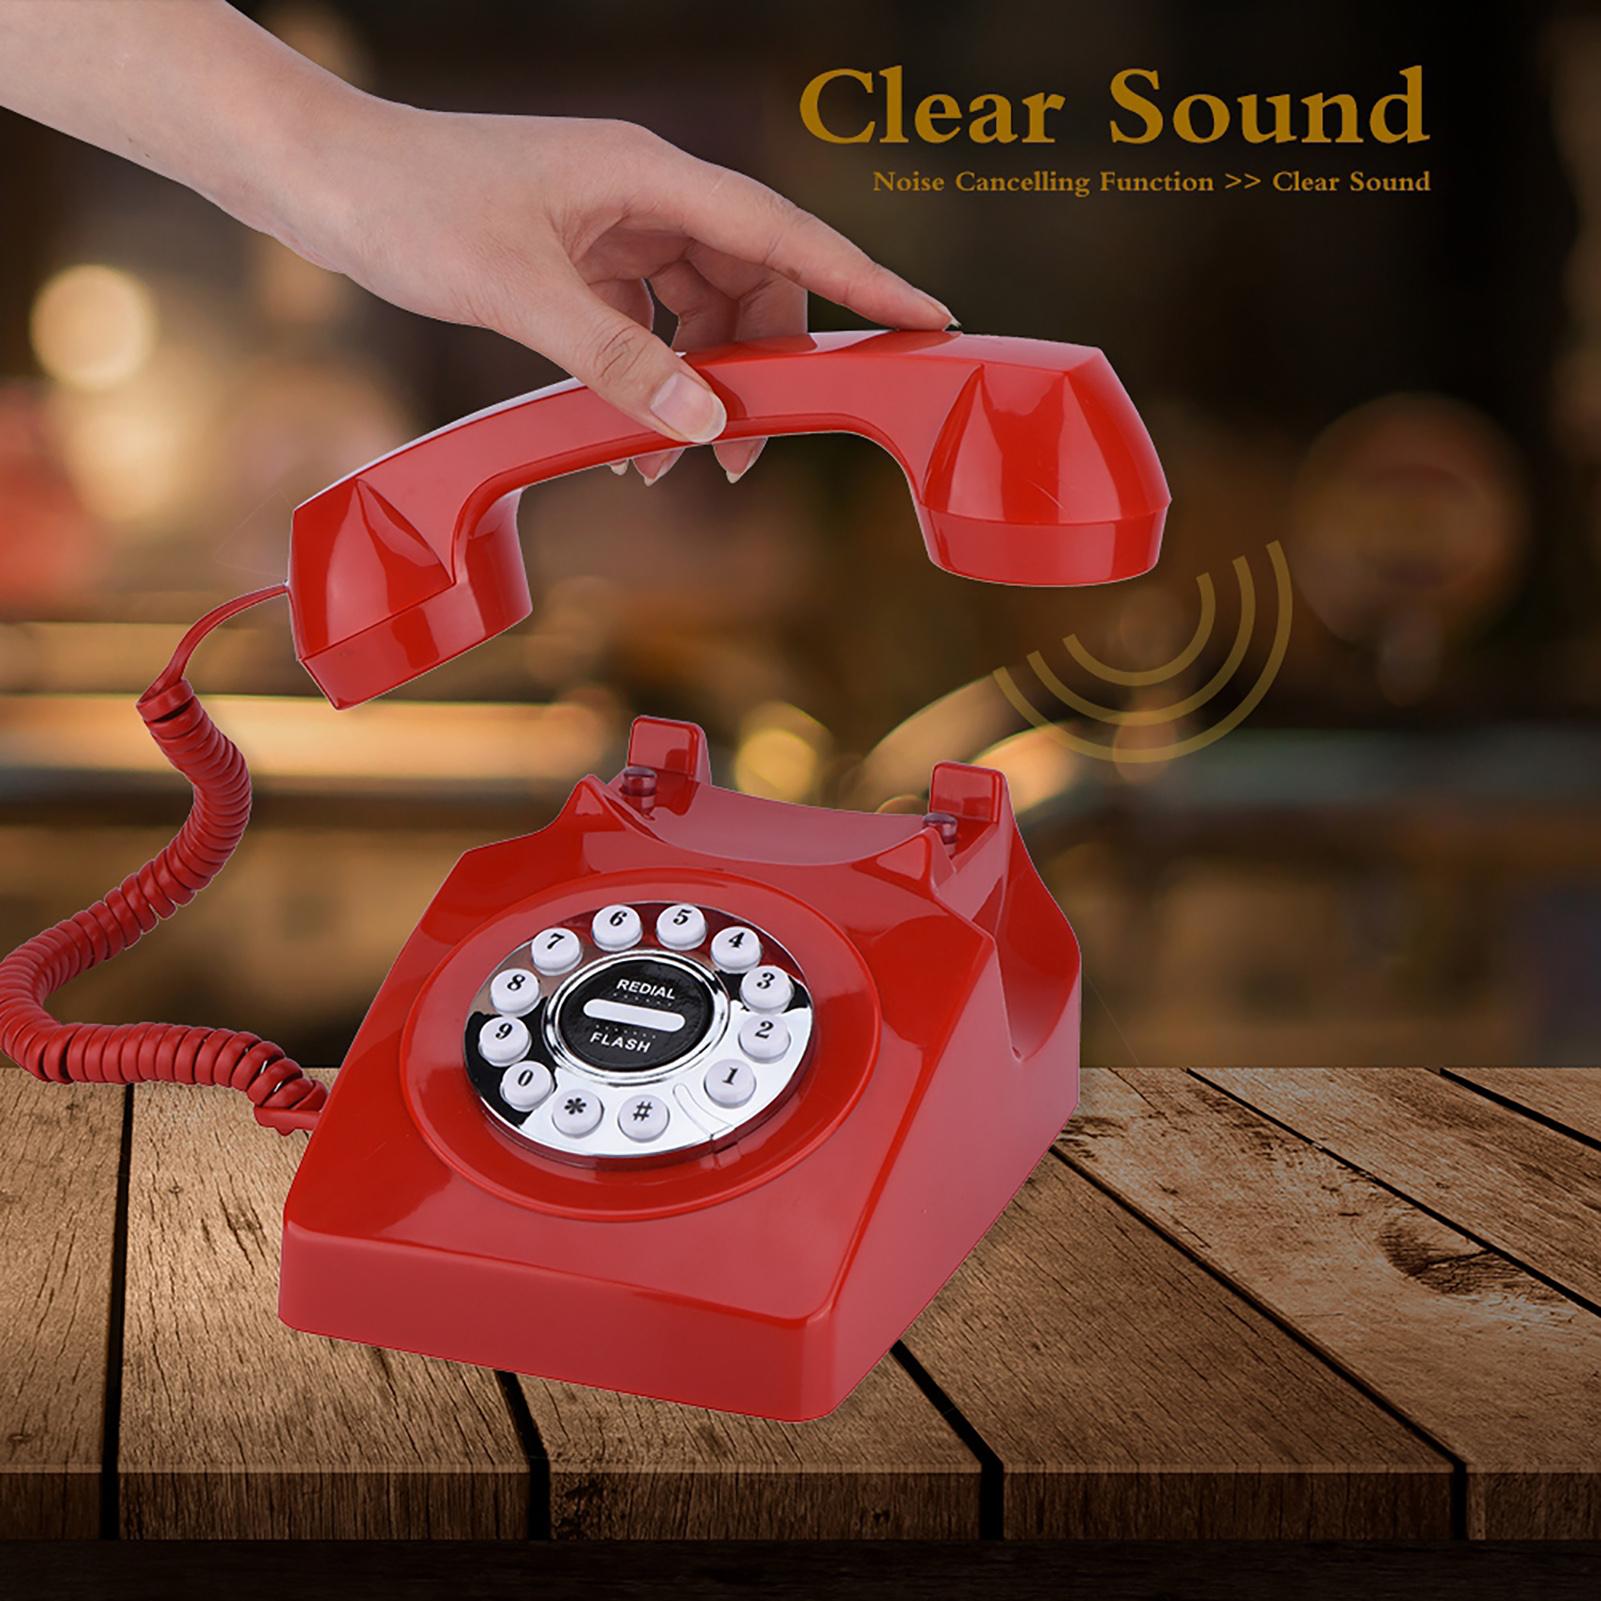 Rotary-Disc-Retro-Phones-Old-Retro-Vintage-Telephone-Home-Desktop-Landline-Phone thumbnail 10